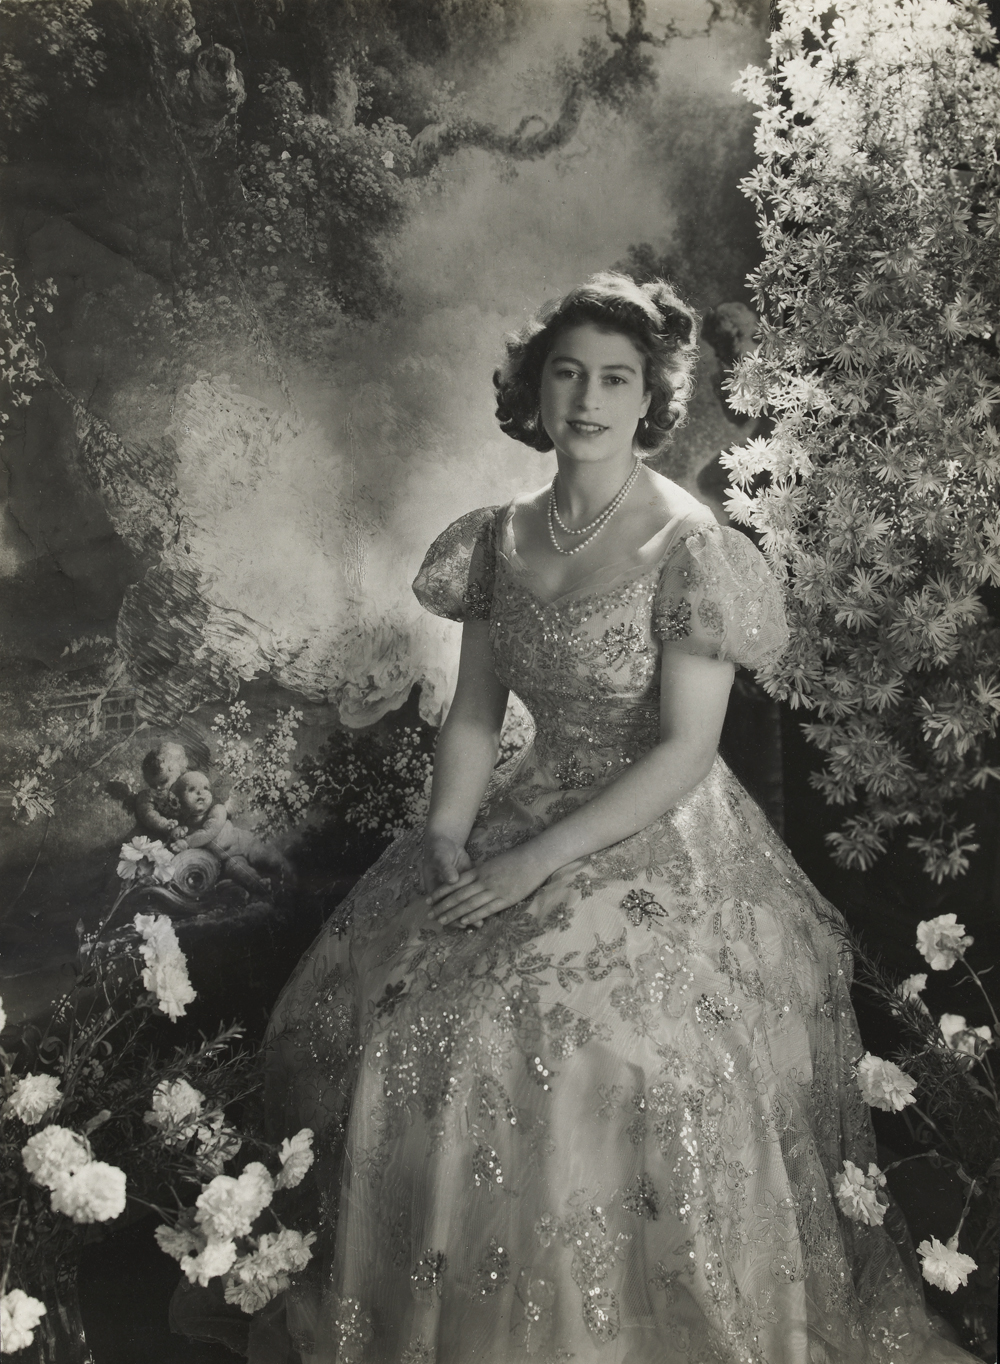 Princess Elizabeth by Cecil Beaton, March 1945. (Image: V&A)